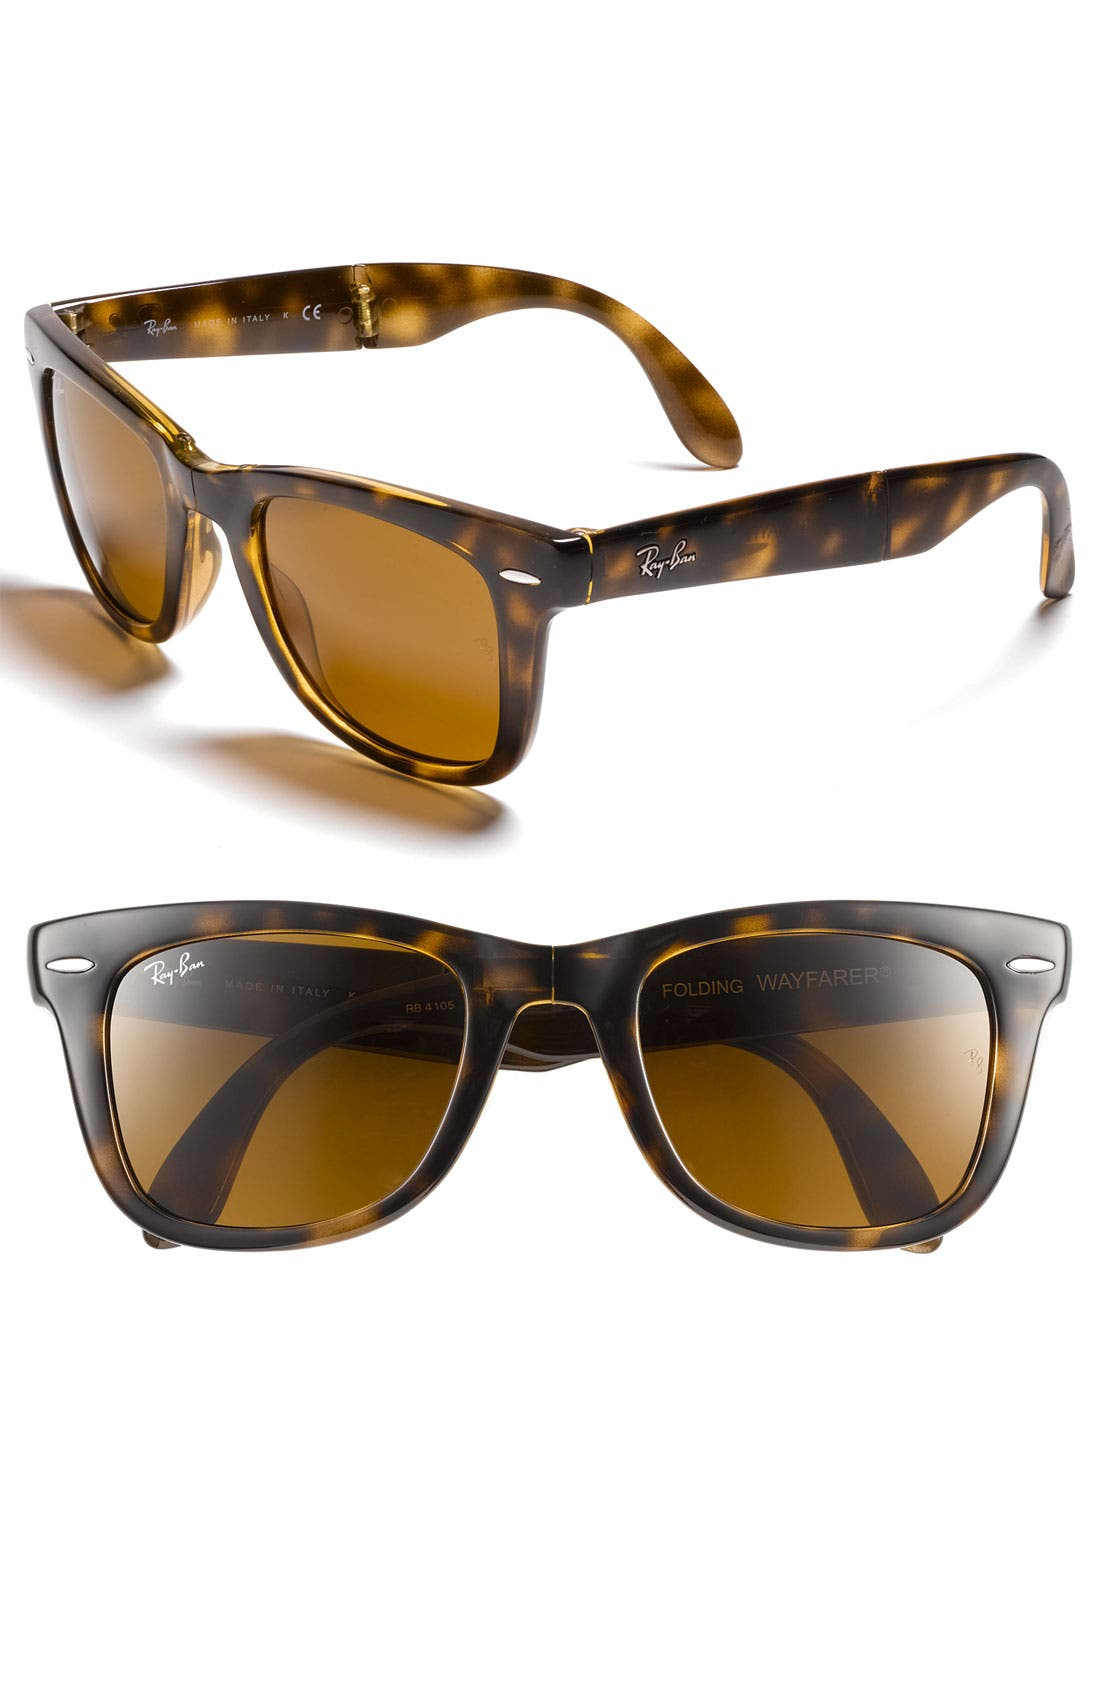 Ray-Ban Standard 50Mm Folding Wayfarer Sunglasses -